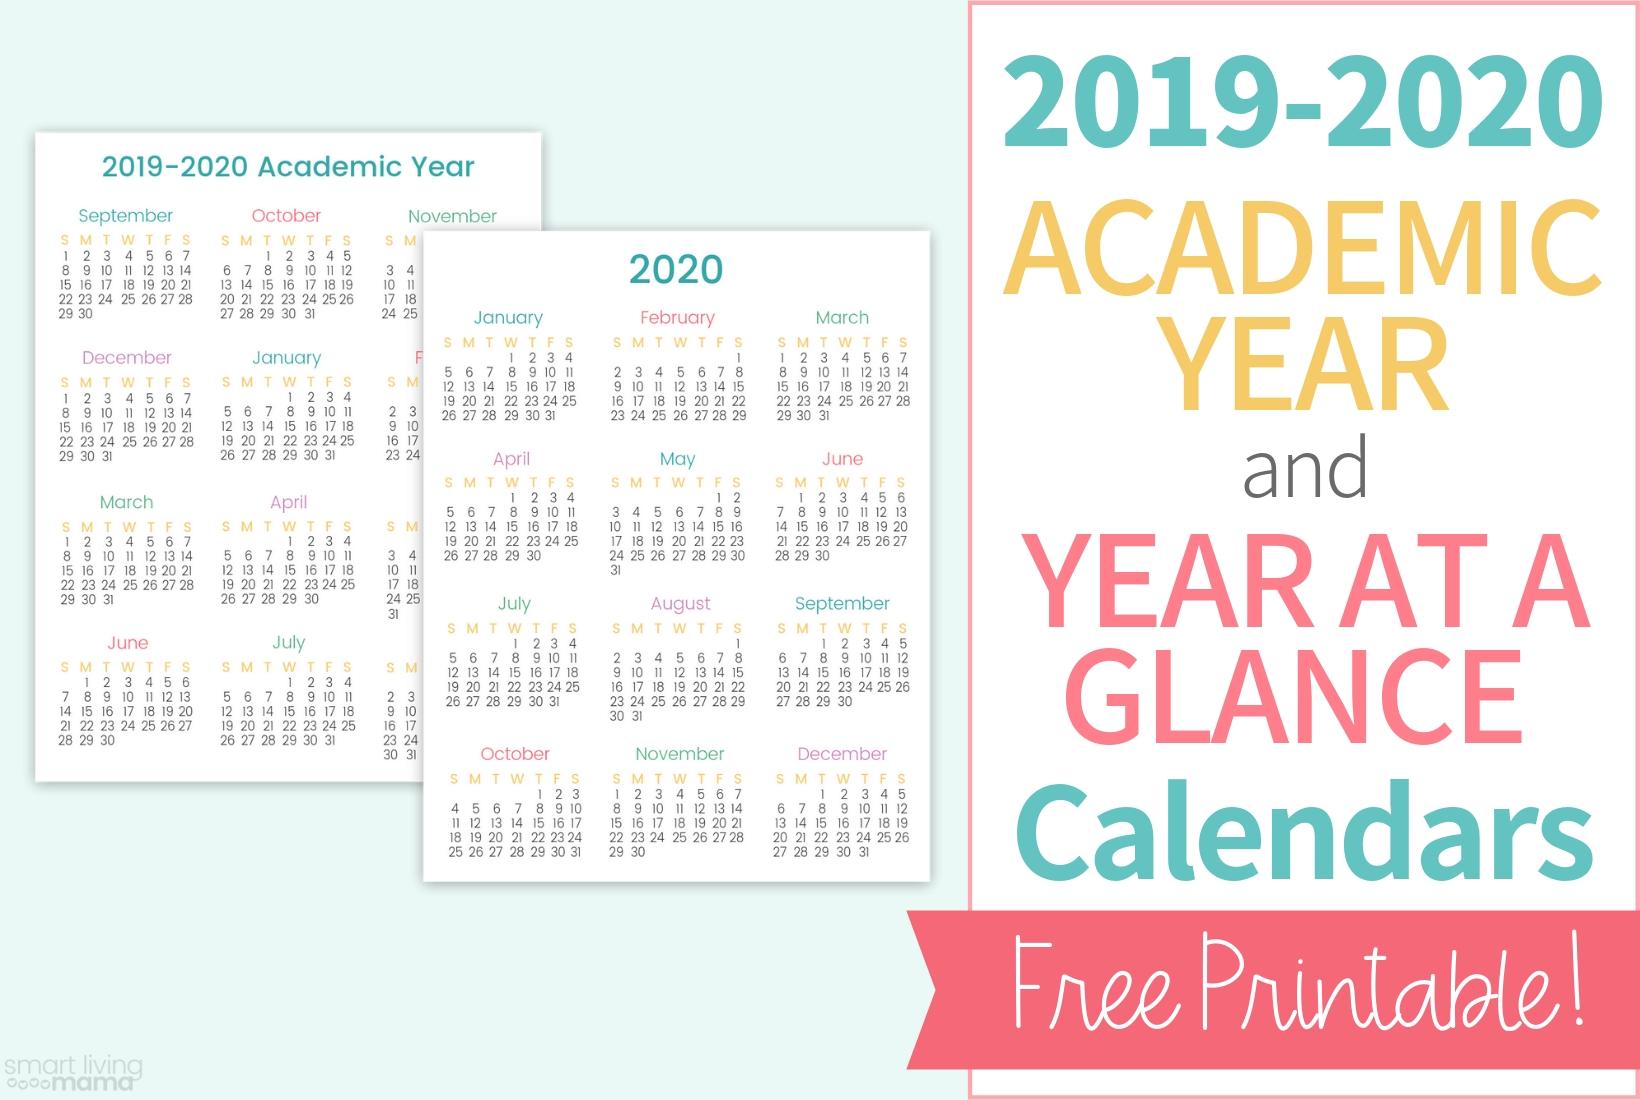 Colorful Printable Calendars For 2019-2020 | Smart Living Mama